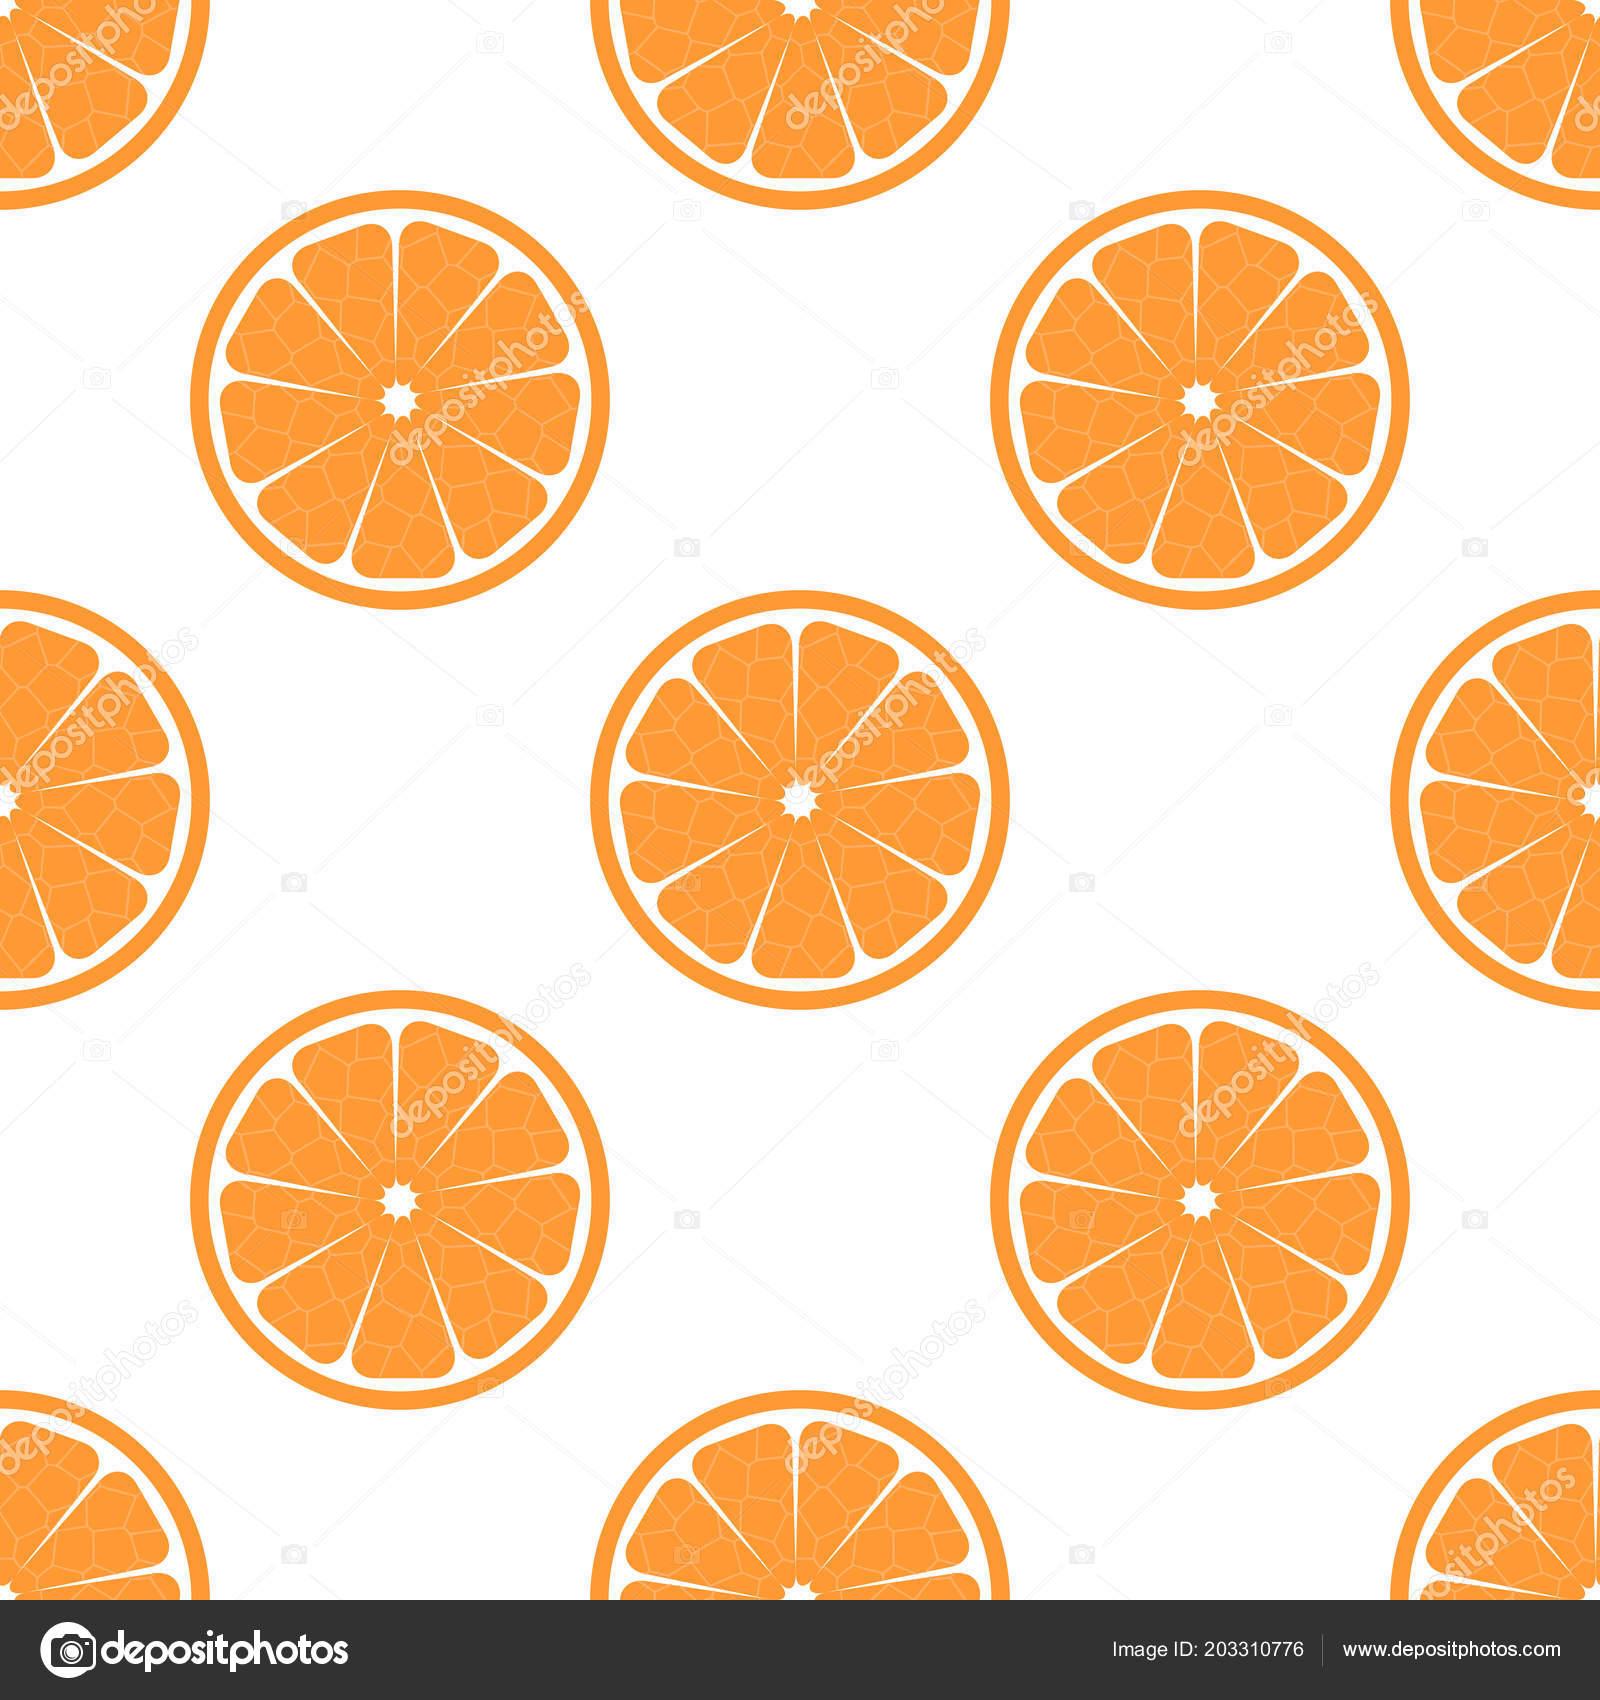 Patrón Vector Transparente Fondo Naranja Fruta Texturas